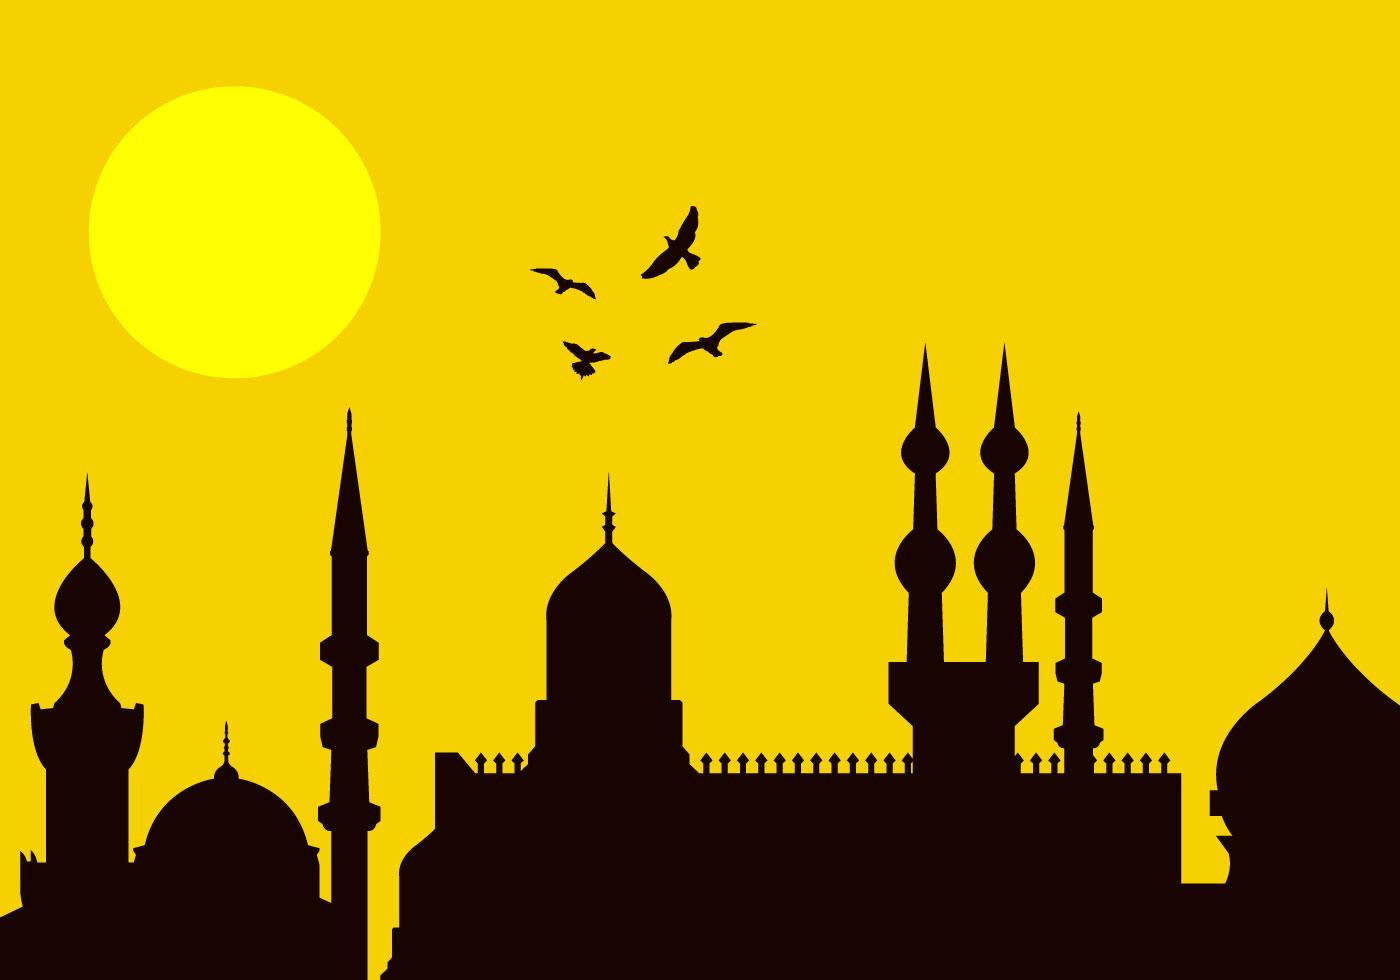 Eid al fitr city silhouette download free vector art for Clipart gratis download